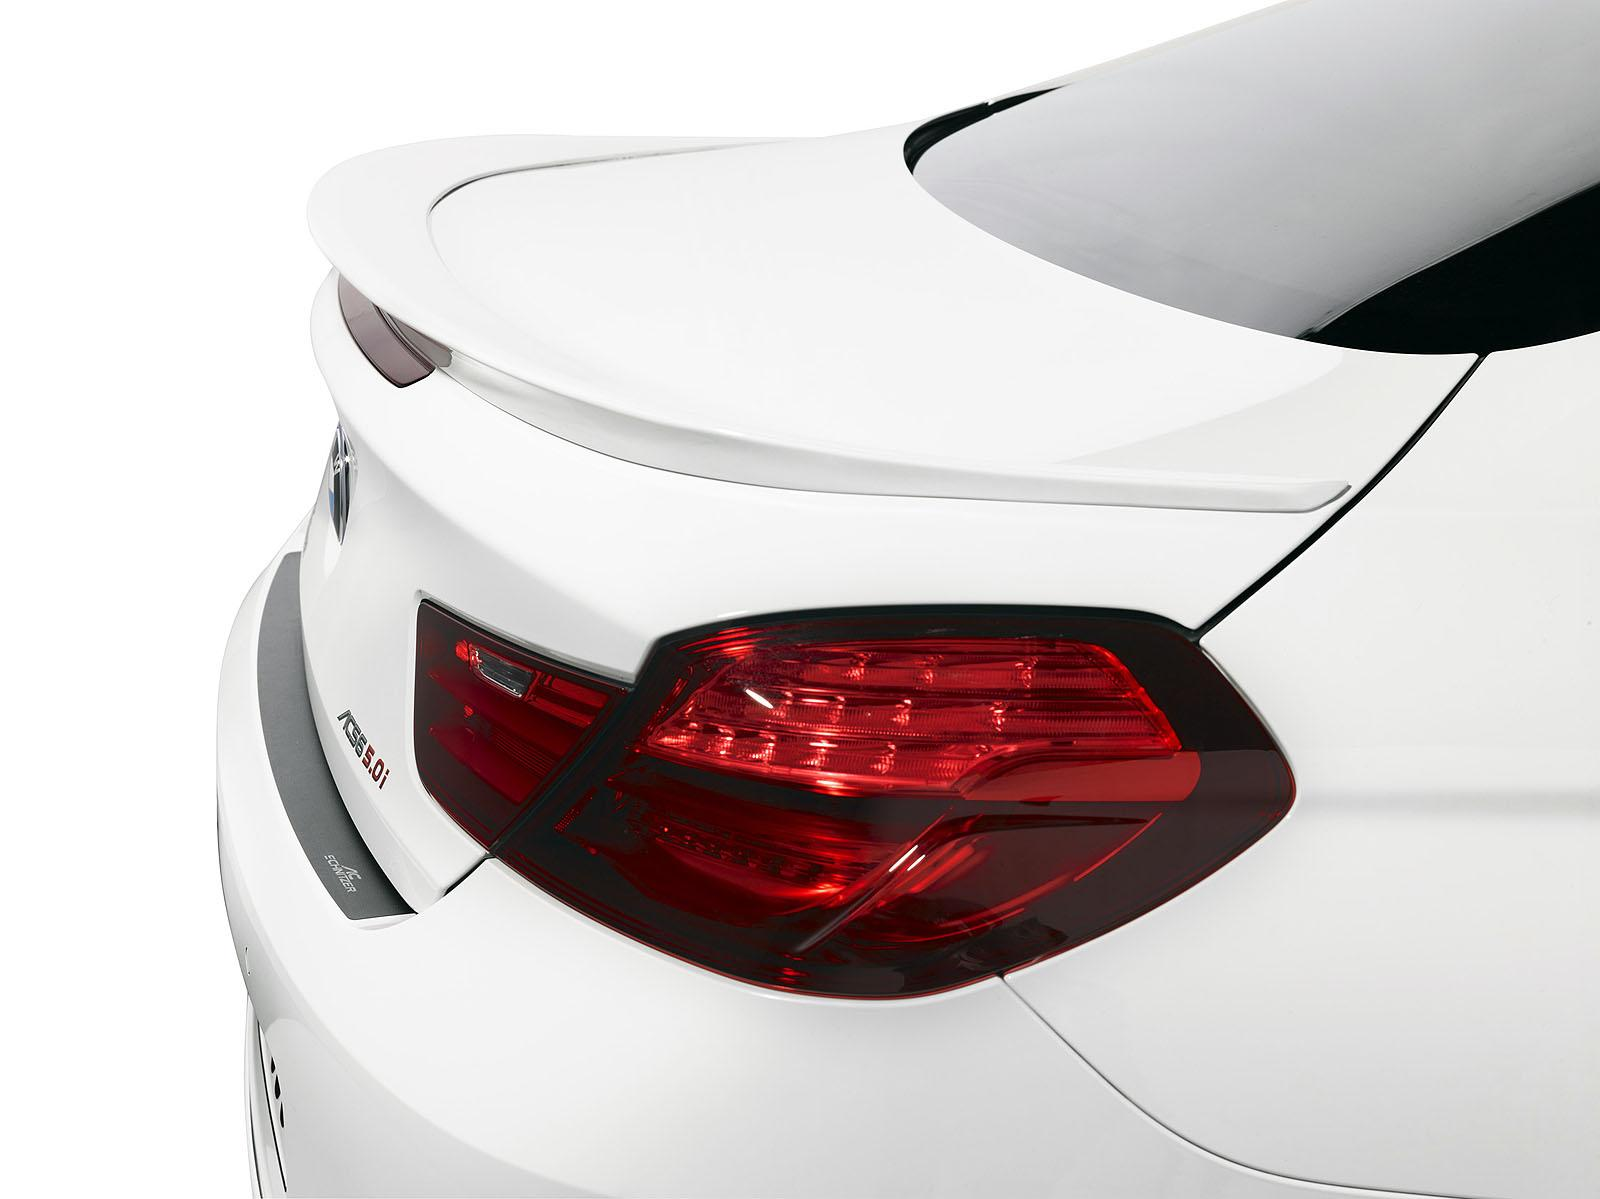 AC Schnitzer BMW 6-Series Coupe F12 [видео] - фотография №9